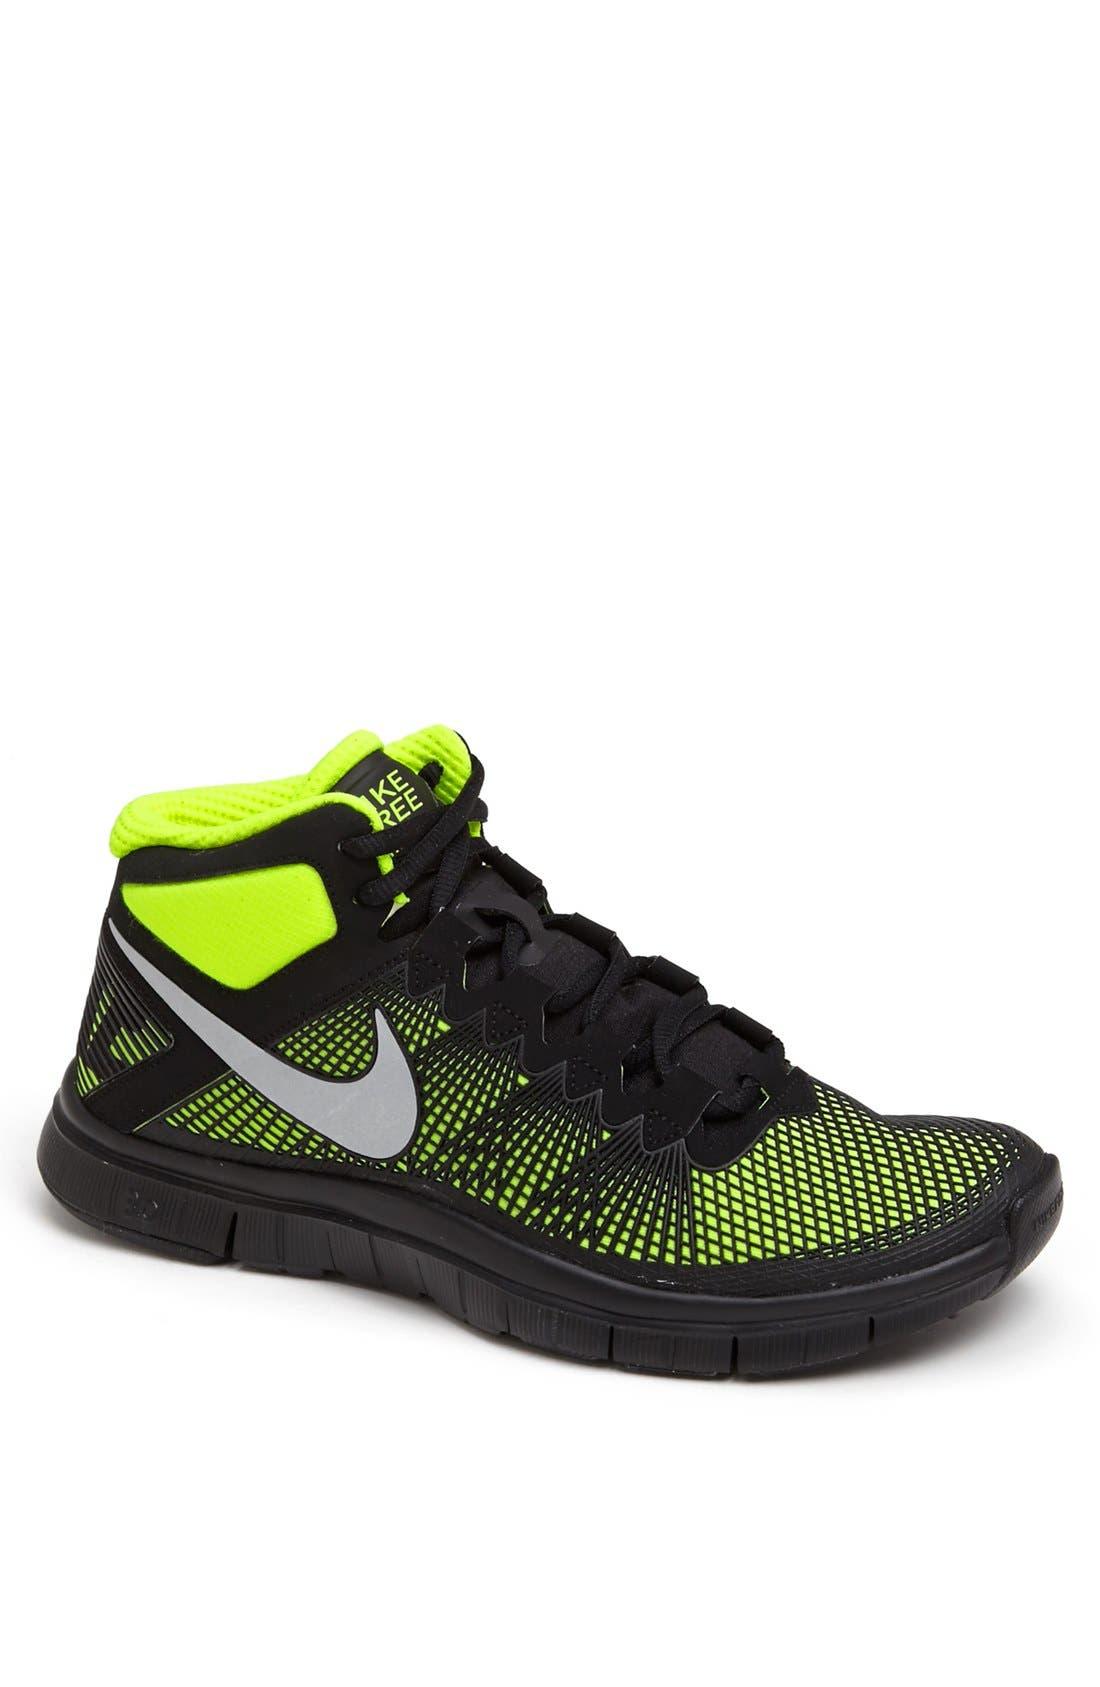 Alternate Image 1 Selected - Nike 'Free Trainer 3.0 Mid' Training Shoe (Men)